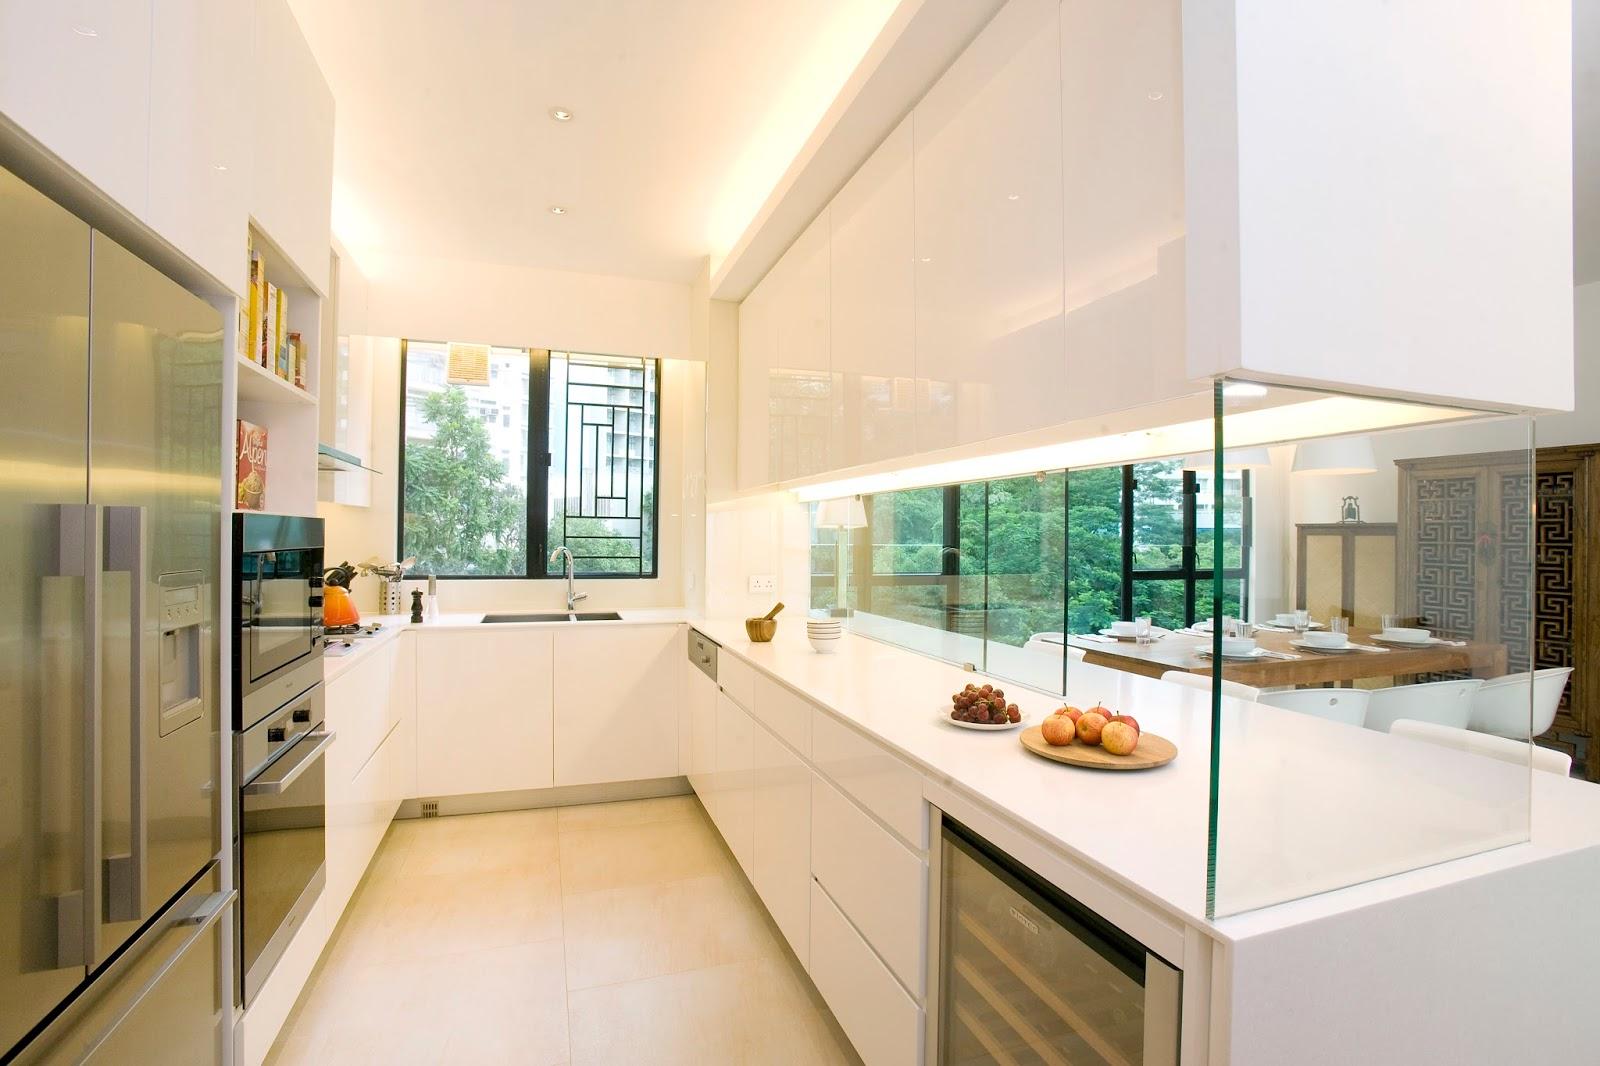 hong kong interior design tips & ideas | clifton leung: timeless